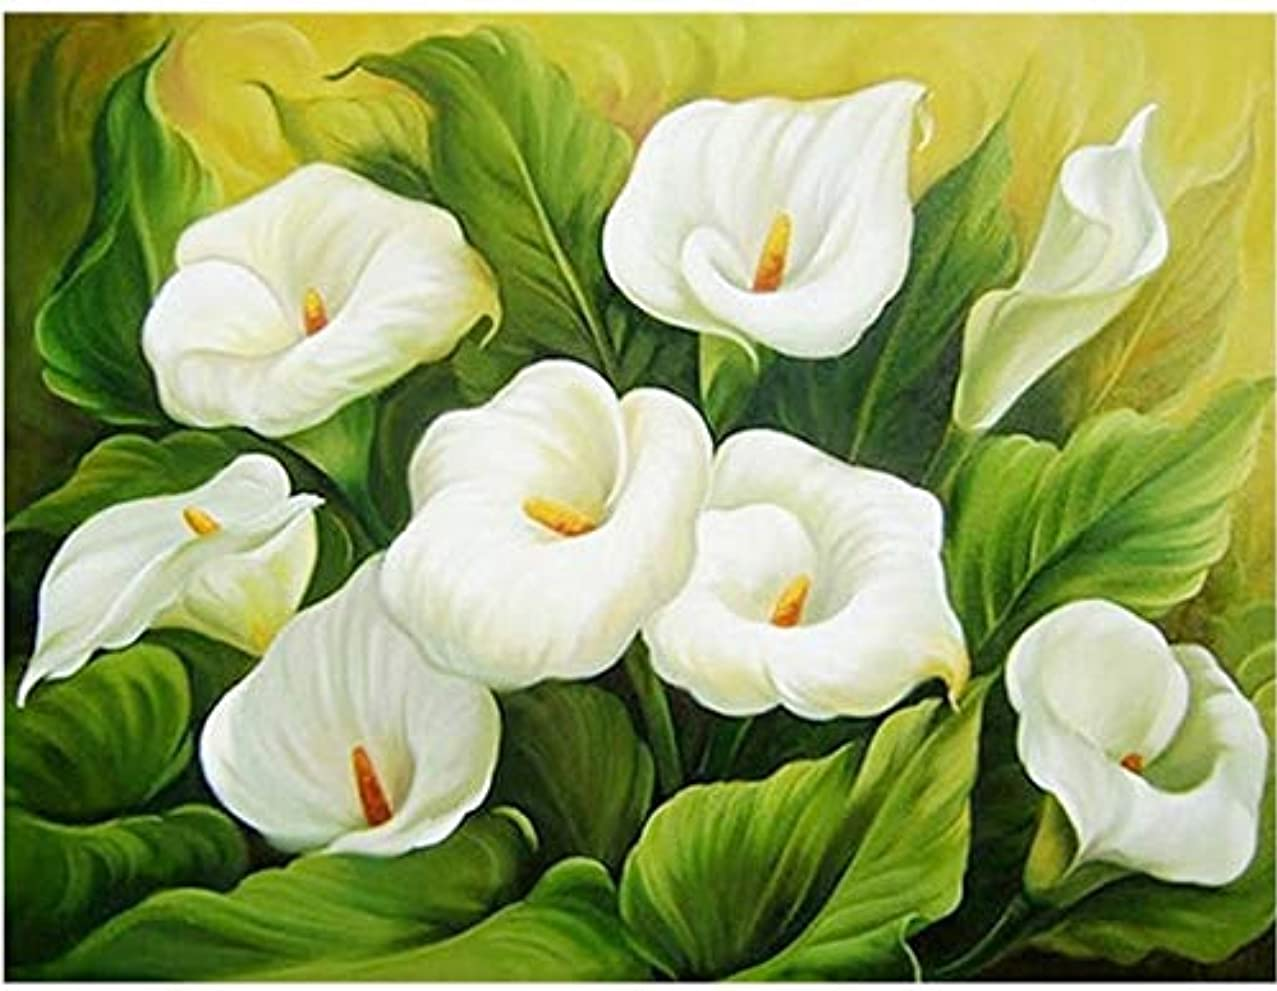 Diamond Mosaic Rhinestones DIY 5D Diamond Painting Flowers White Calla Lily Cross Stitch Diamond Embroidery Canvas Painting